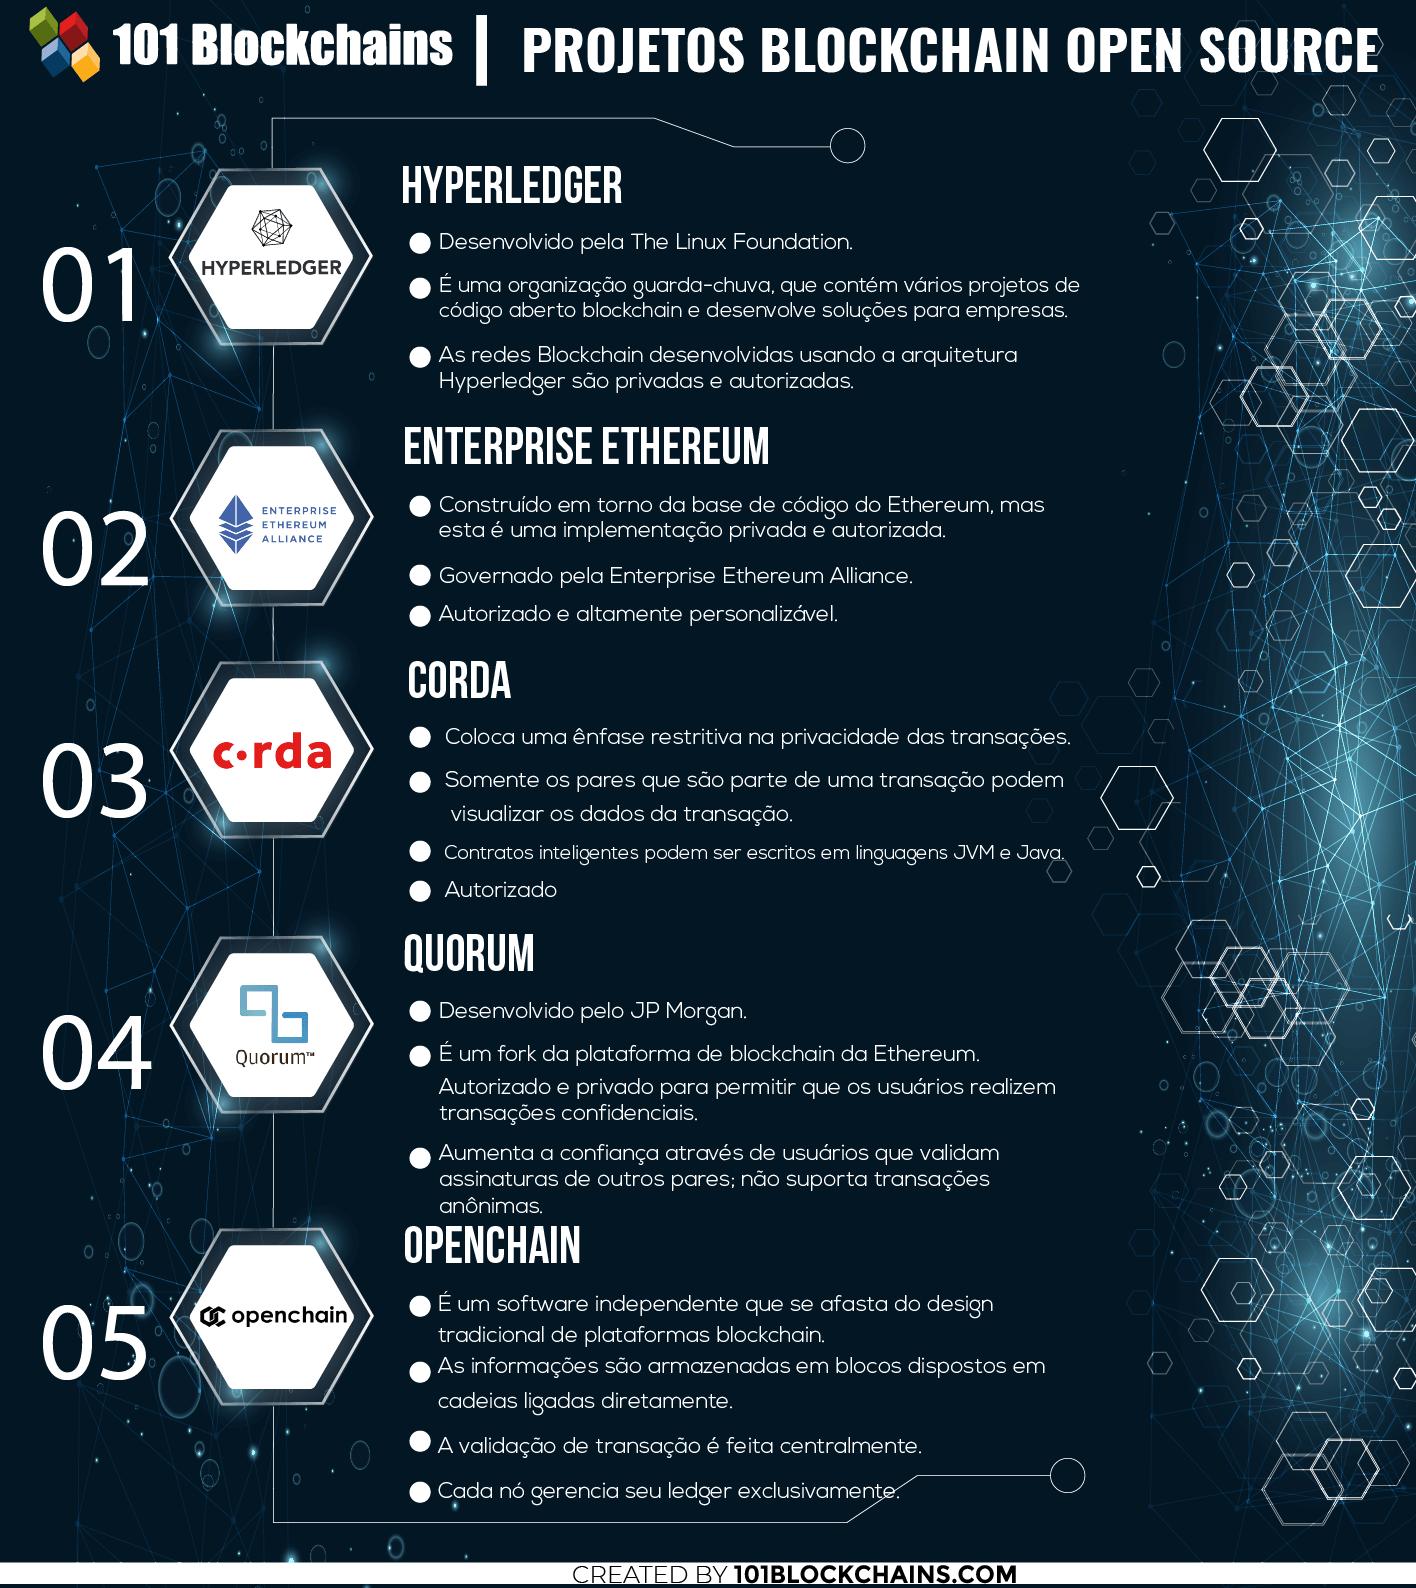 Projetos Blockchain Open Source